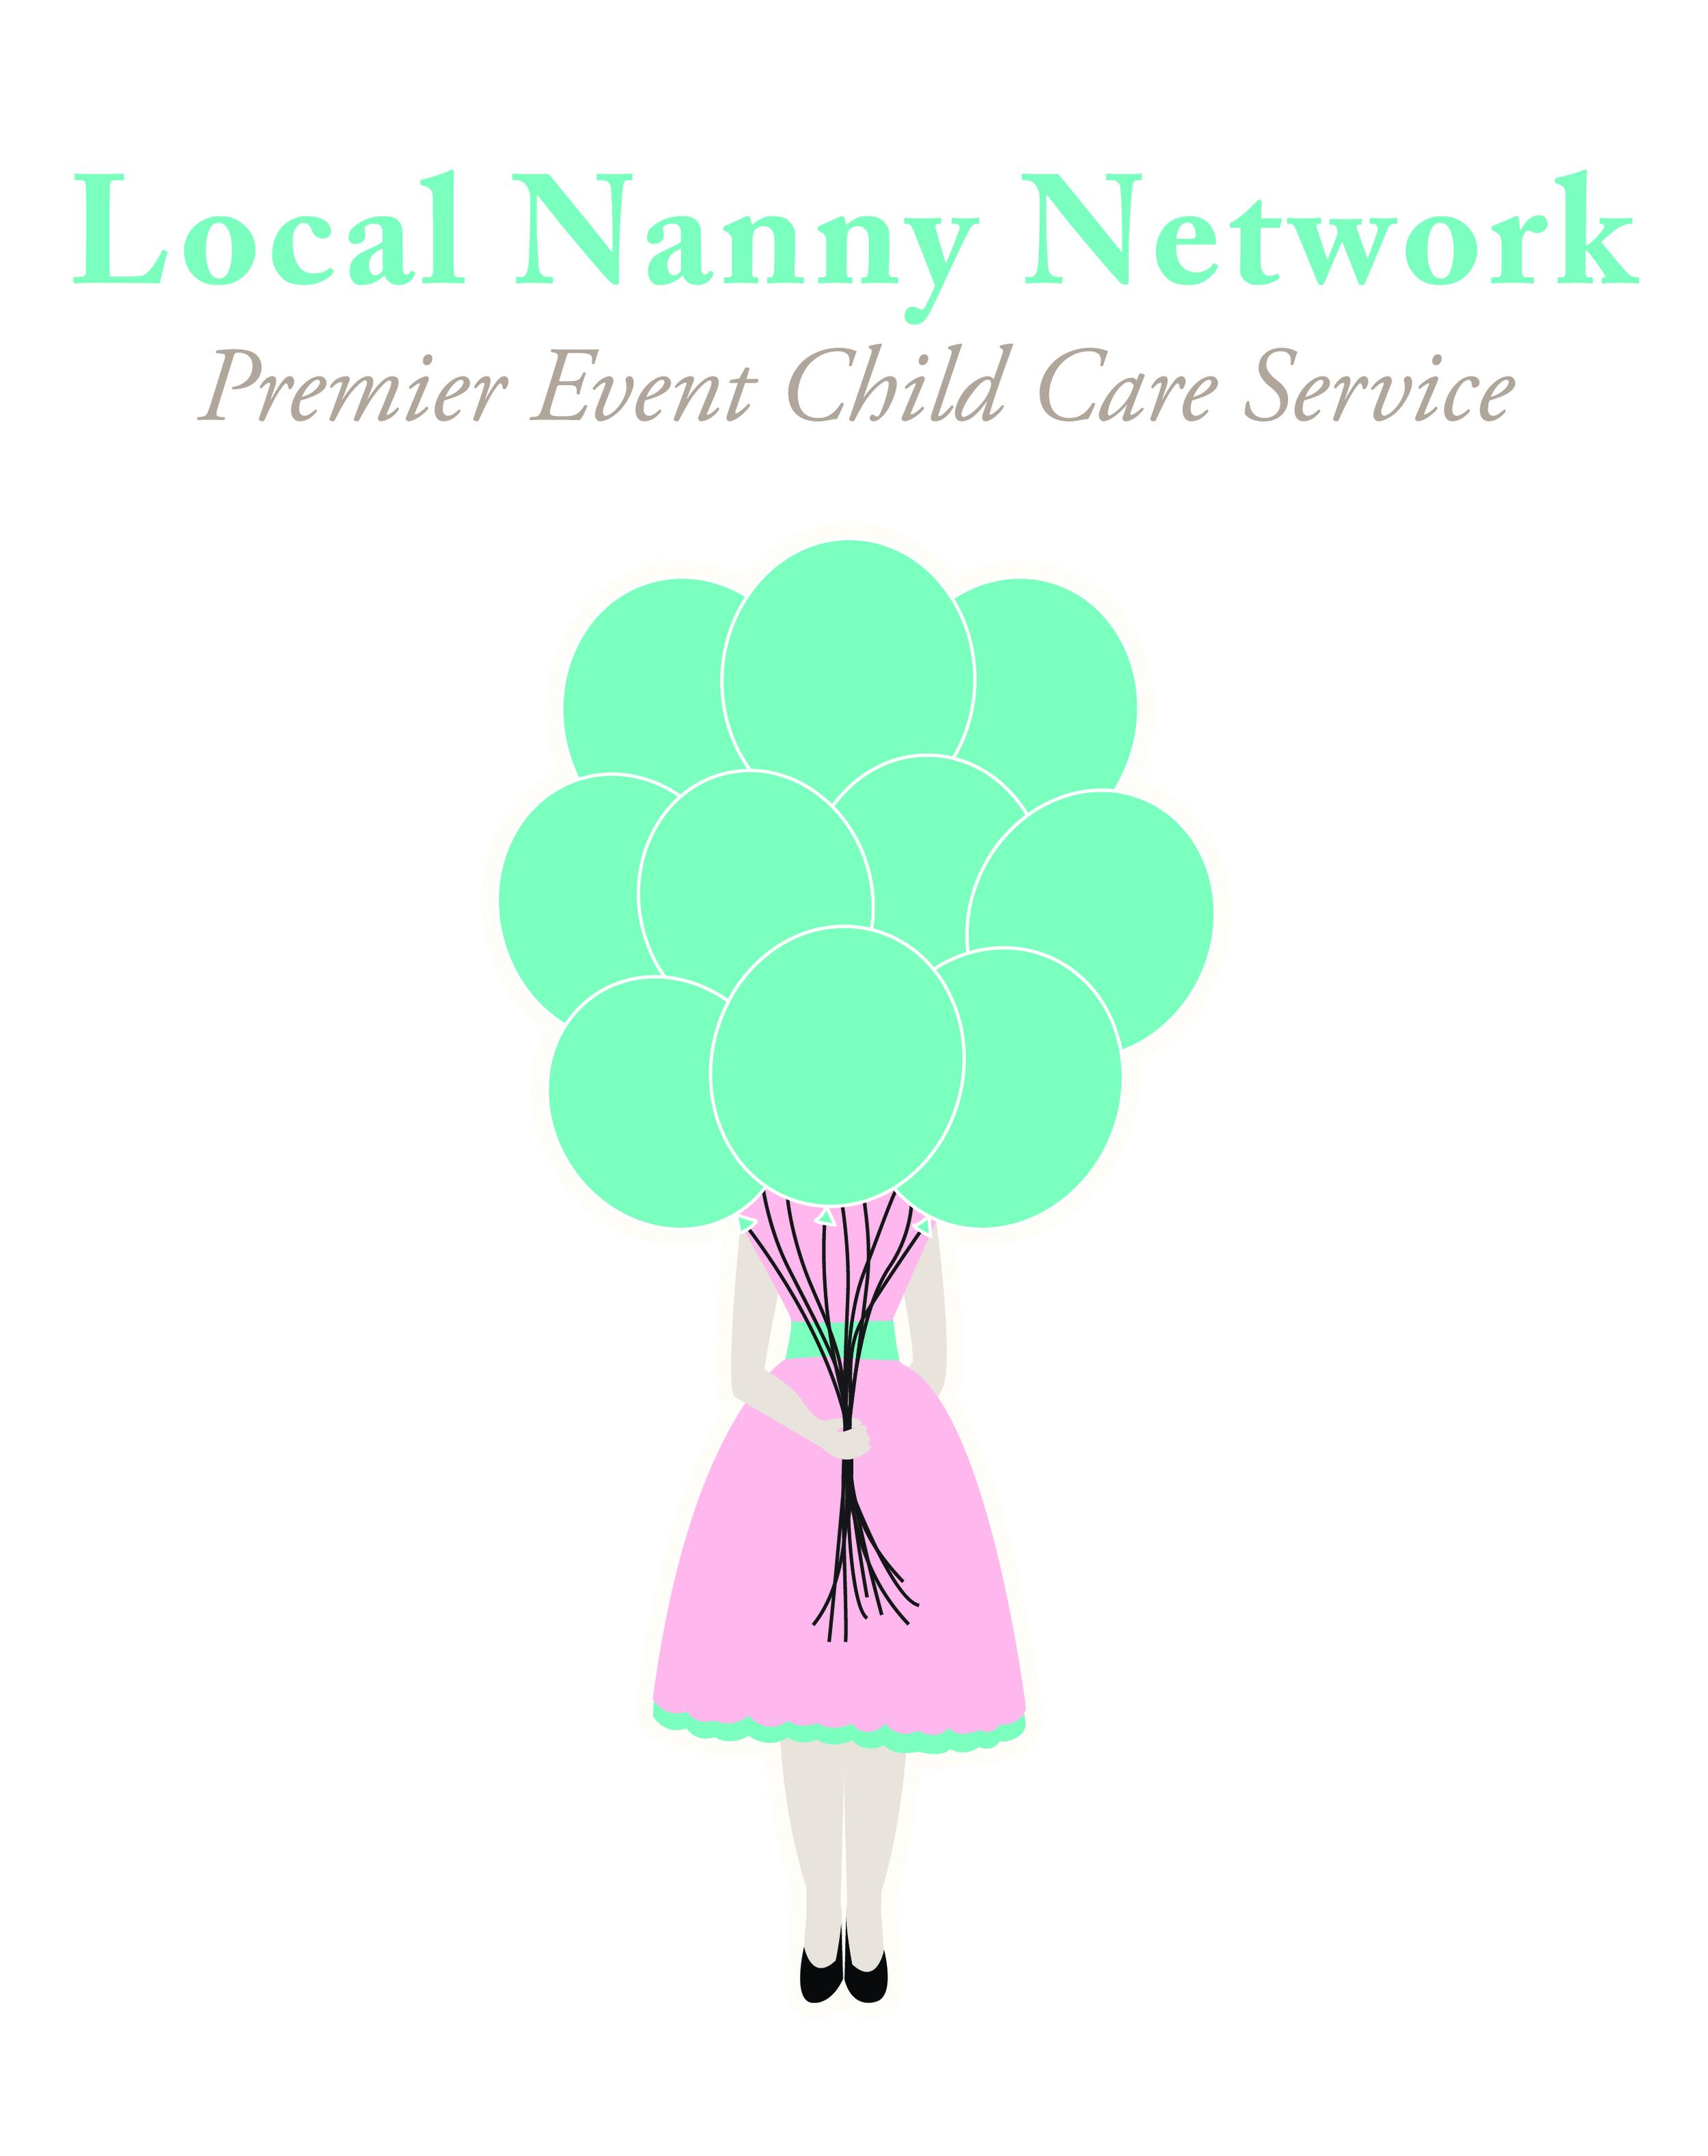 Local Nanny Network Logo.jpg